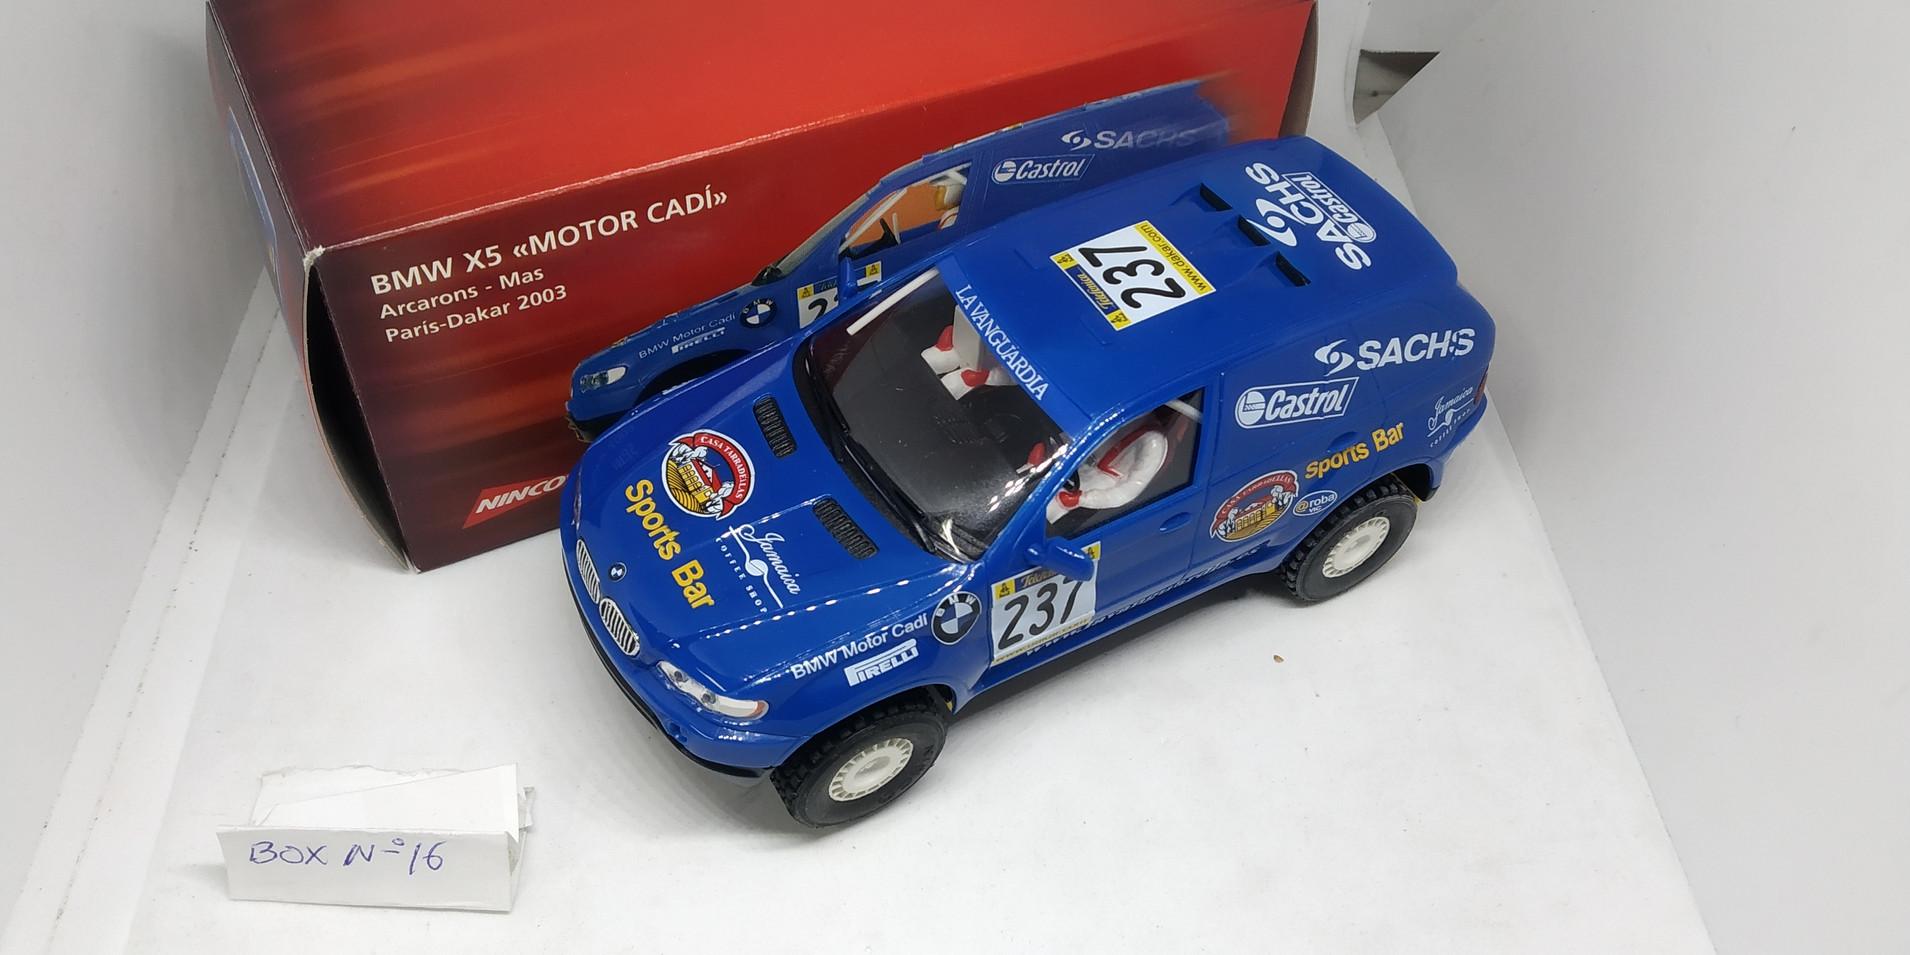 "BMW X5 ""MOTOR CADI"" SALVAT NINCO"